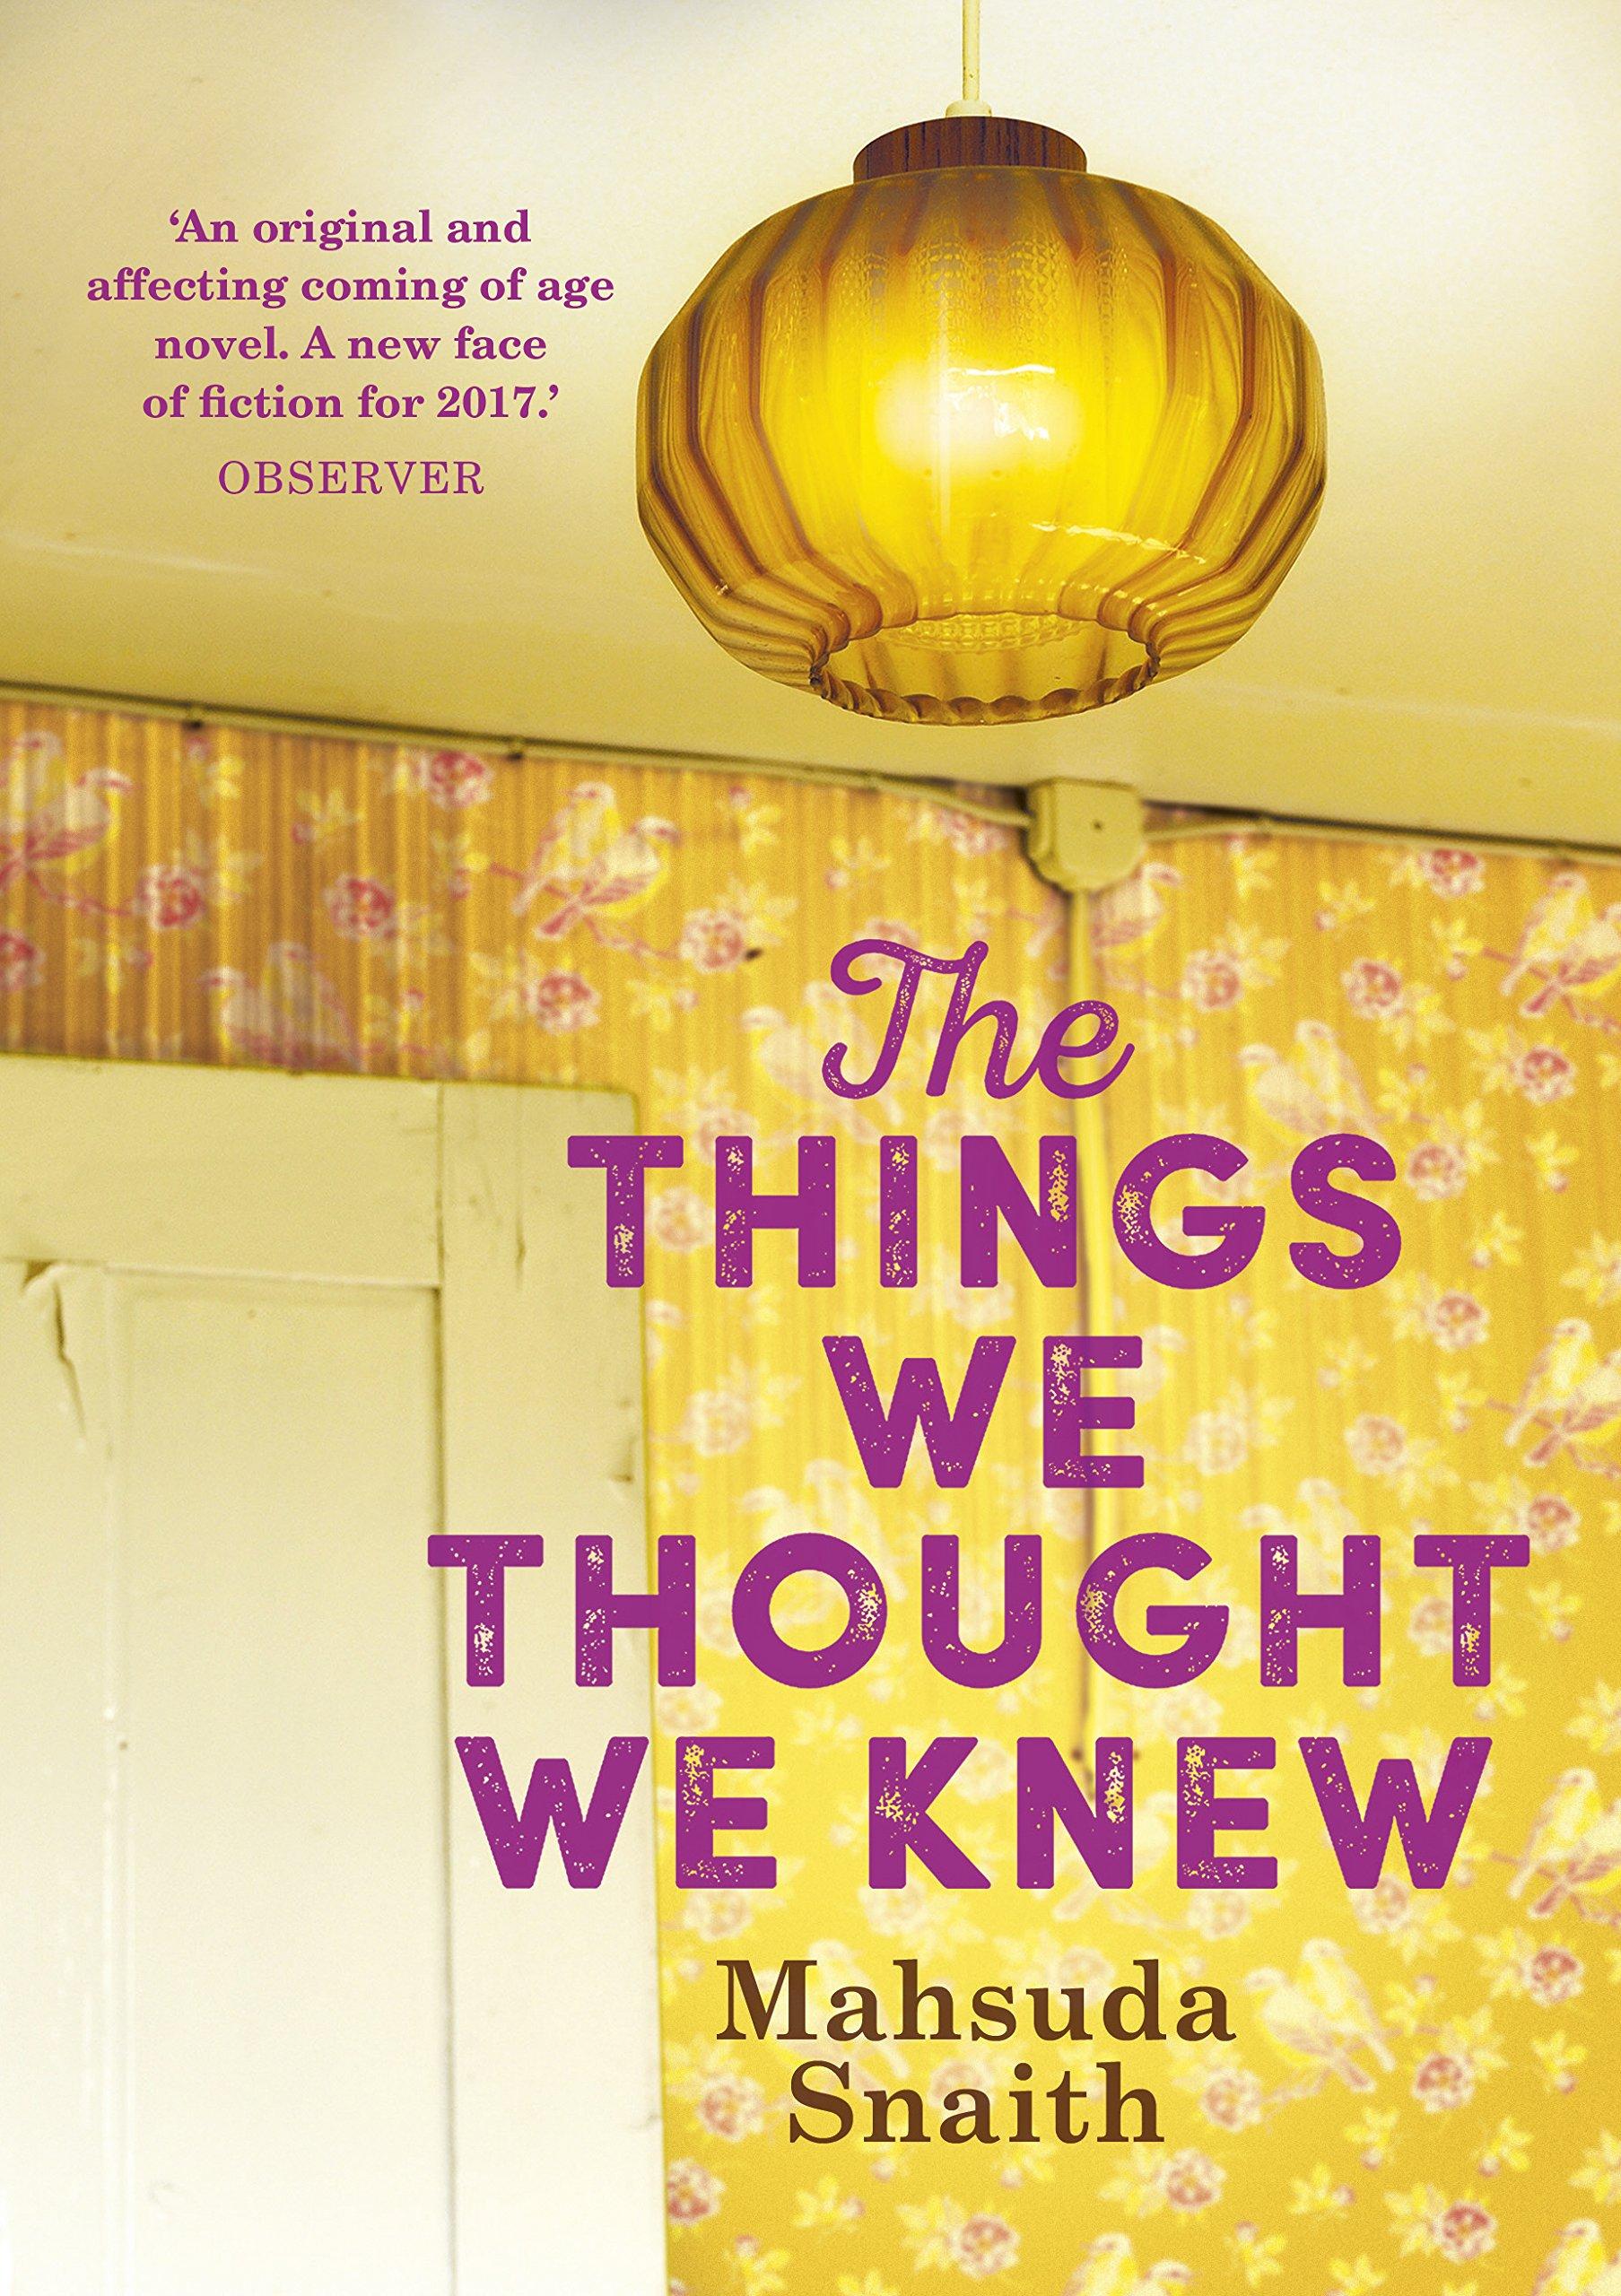 The Things We Thought We Knew: Amazon.co.uk: Mahsuda Snaith: 9780857524683:  Books